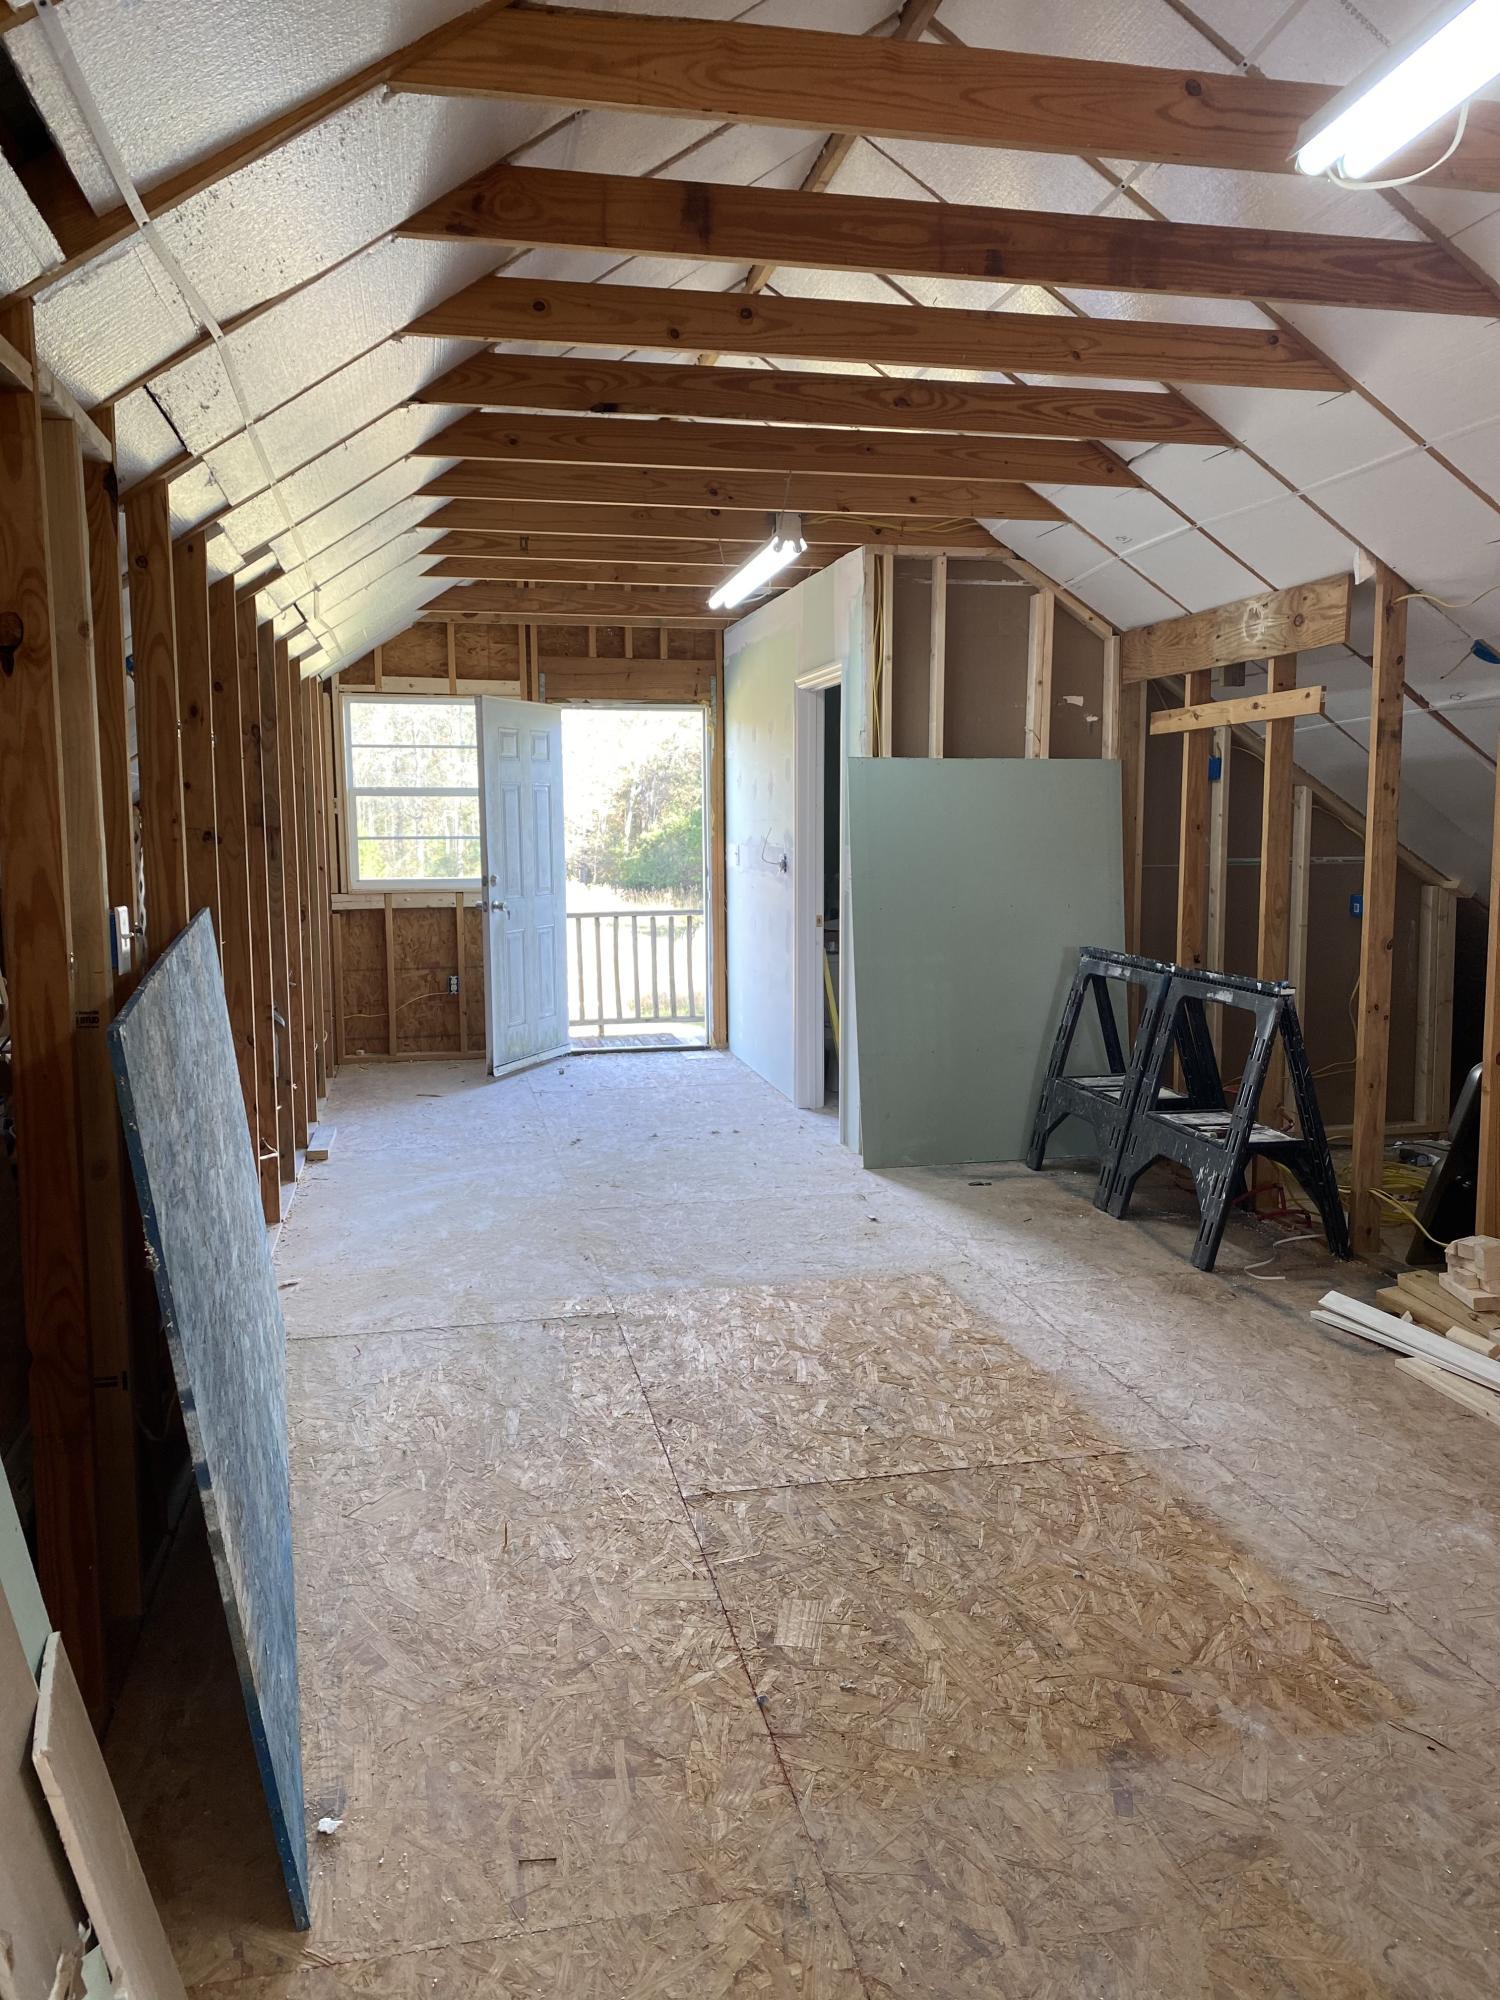 New Hope Estates Homes For Sale - 304 Harvey Farm, Summerville, SC - 0